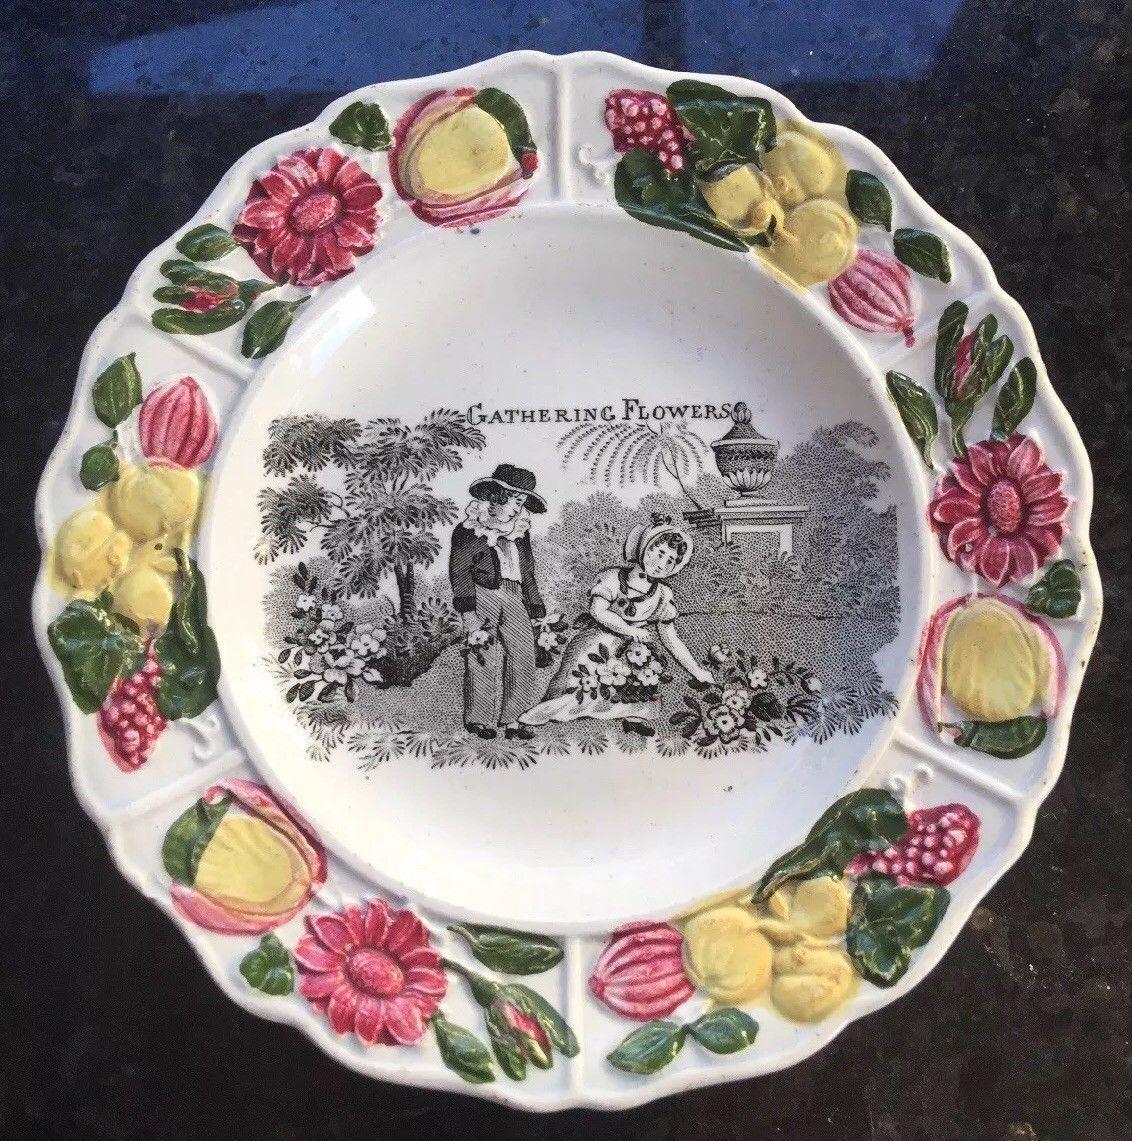 Antique Victorian Children S Pottery Plate Gathering Flowers Ebay Pottery Plates Plates Pottery